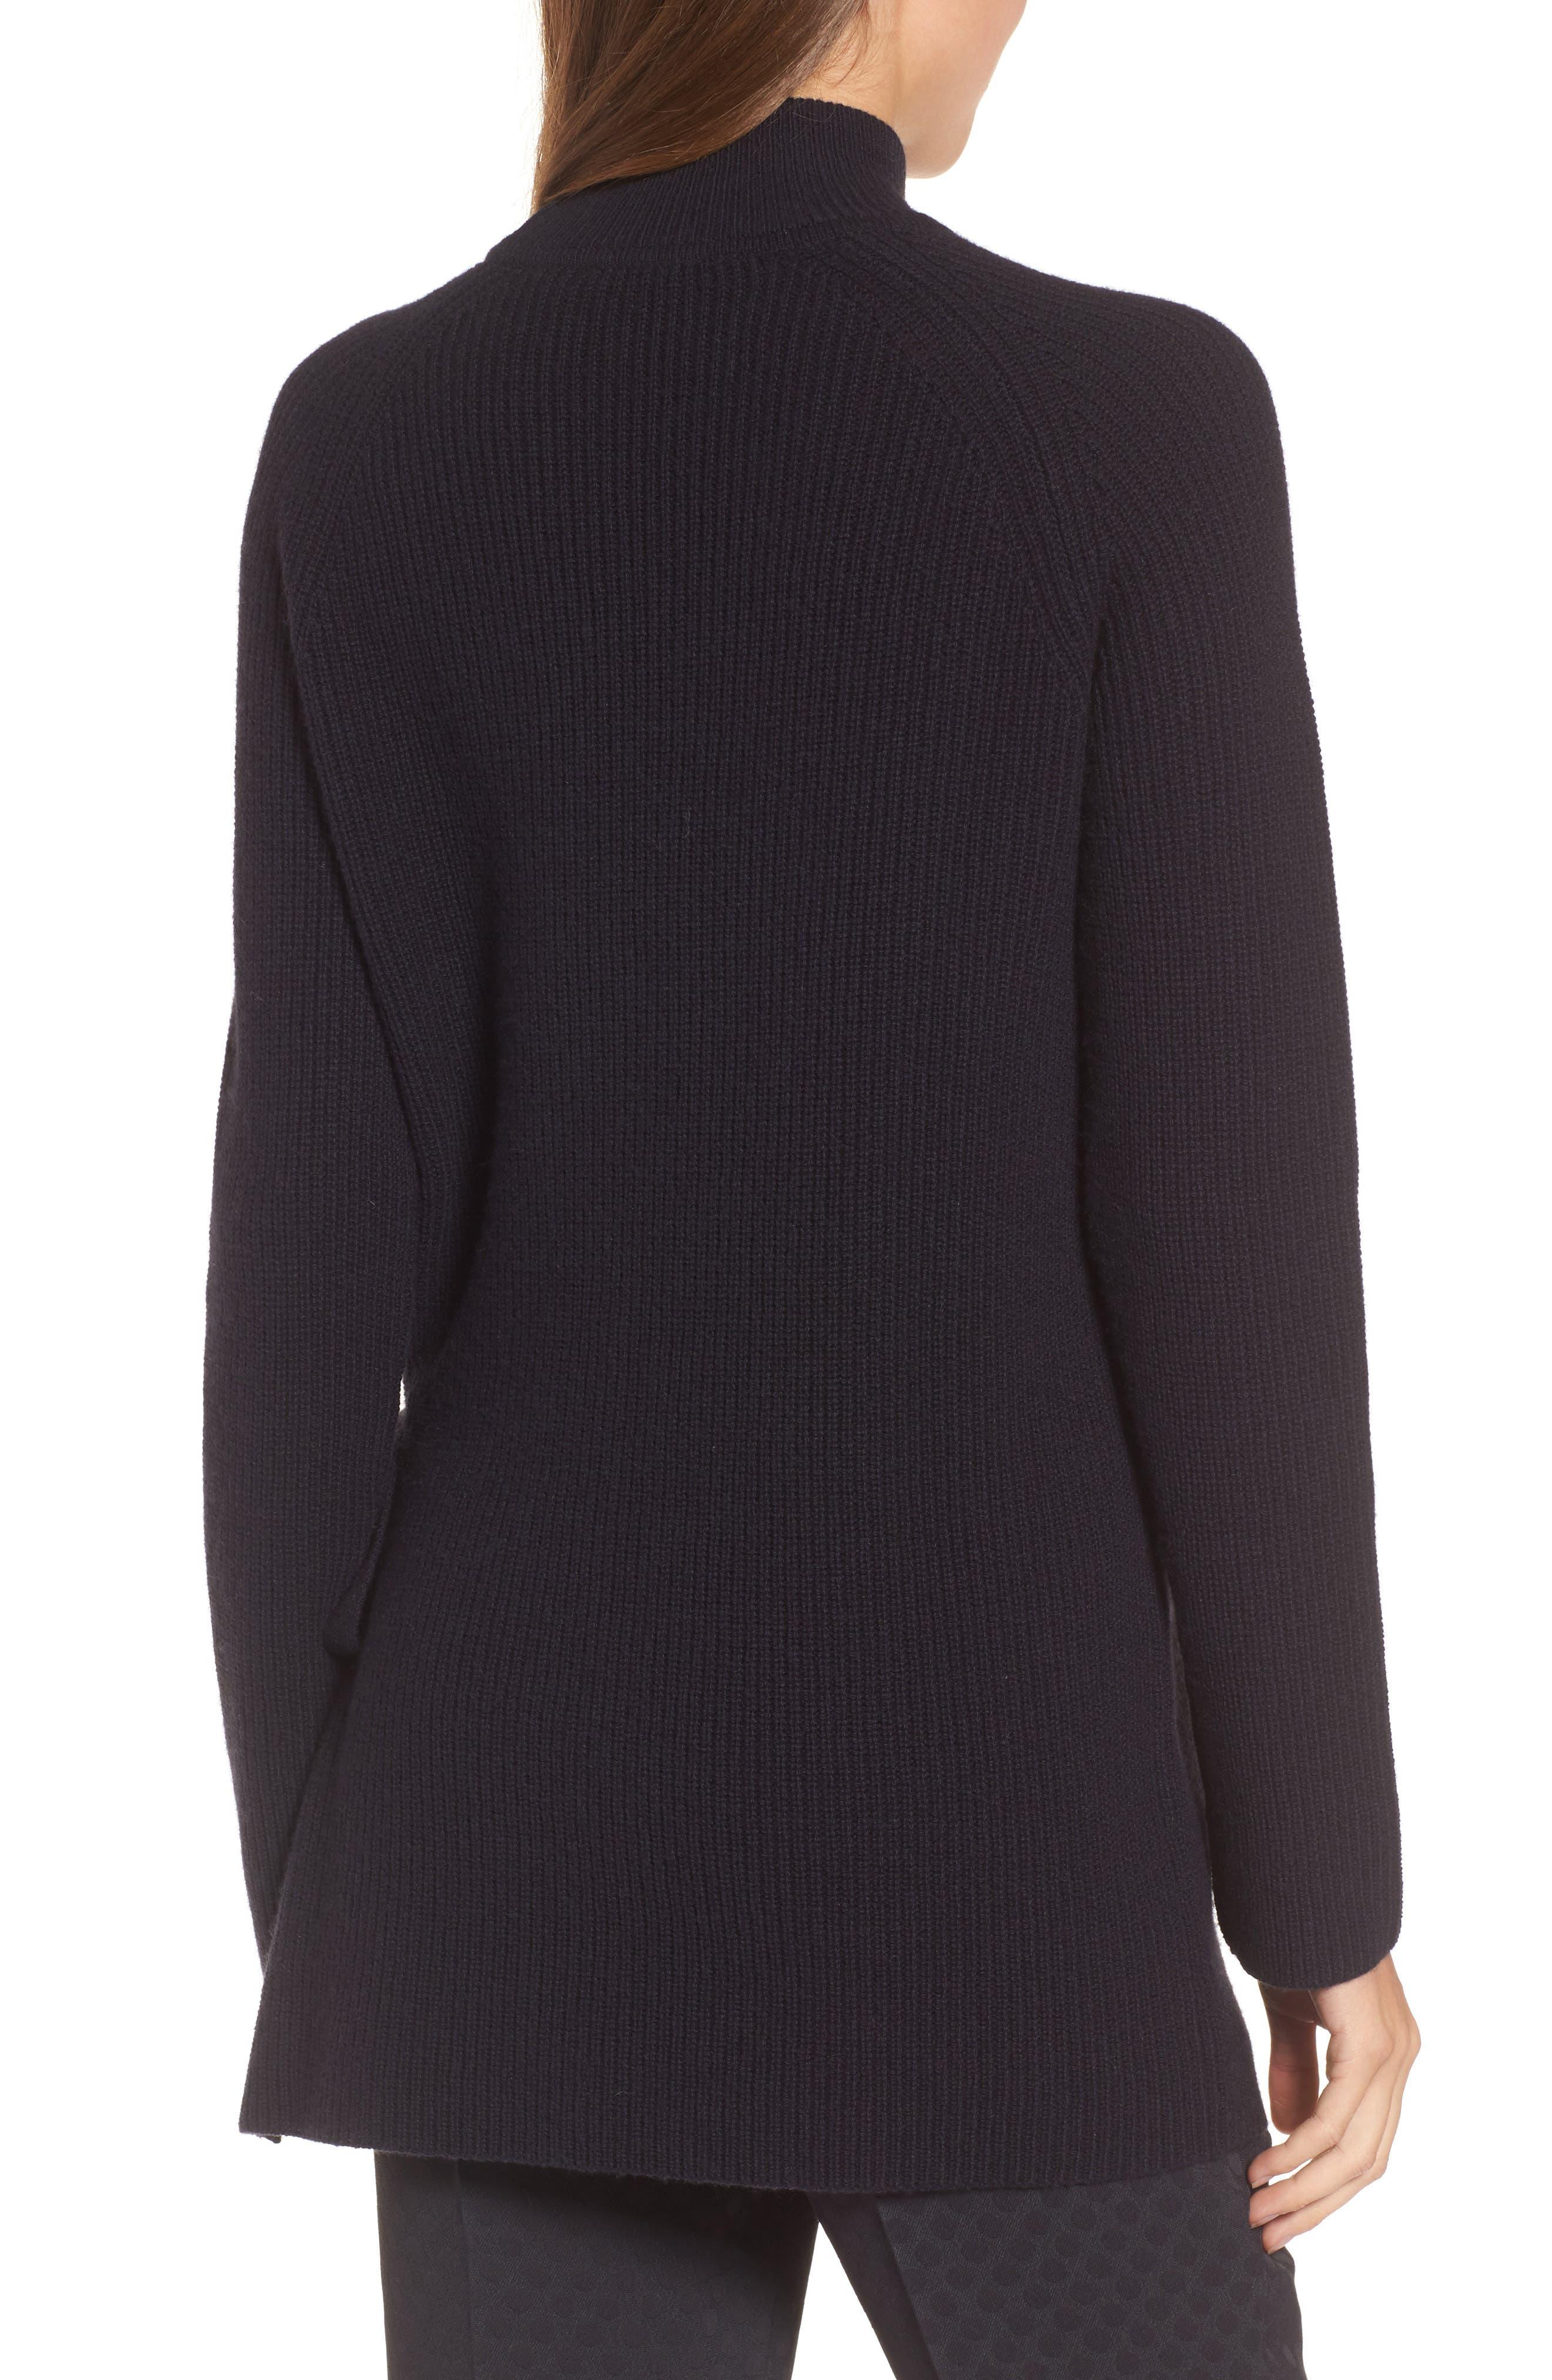 Filda Tie Side Wool Blend Sweater,                             Alternate thumbnail 2, color,                             480